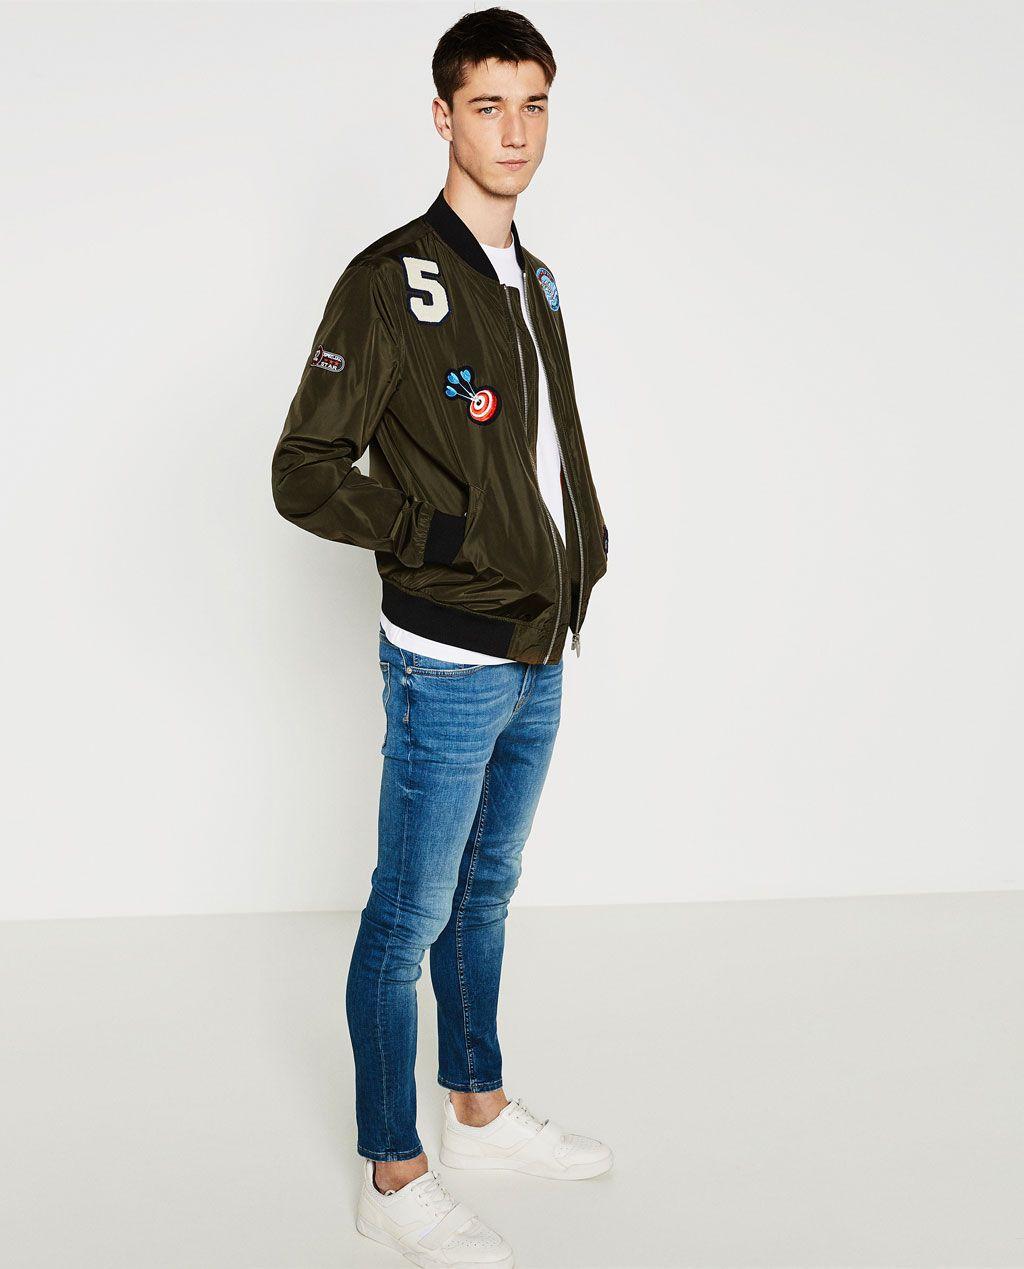 Zara Man Patch Bomber Jacket Style Fashion Hombres Pinterest